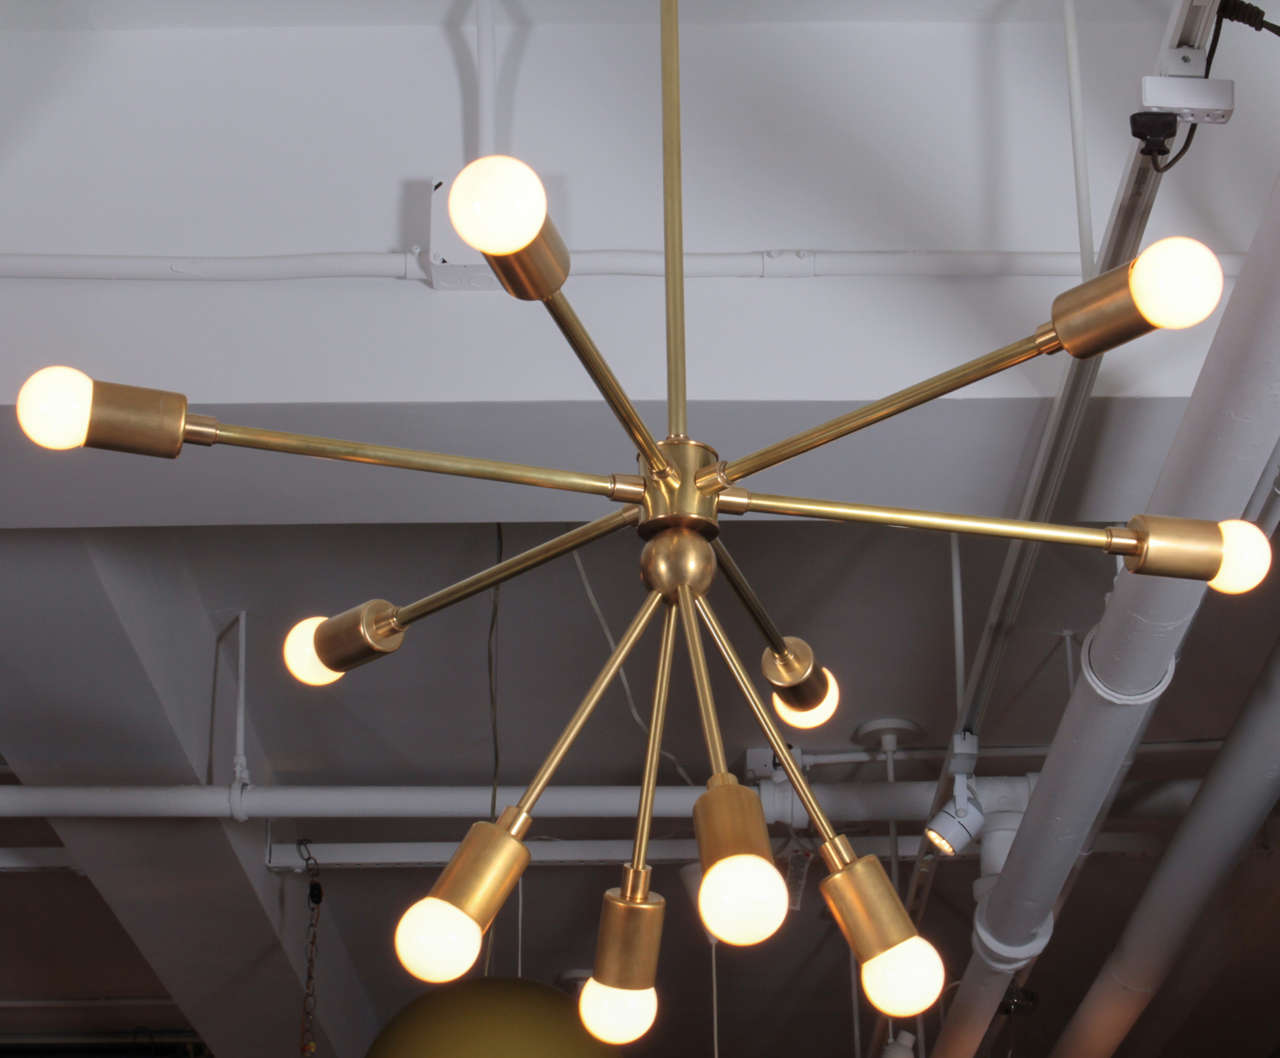 Custom Macomber Modern Brass Sputnik Light Fixture For Sale 1